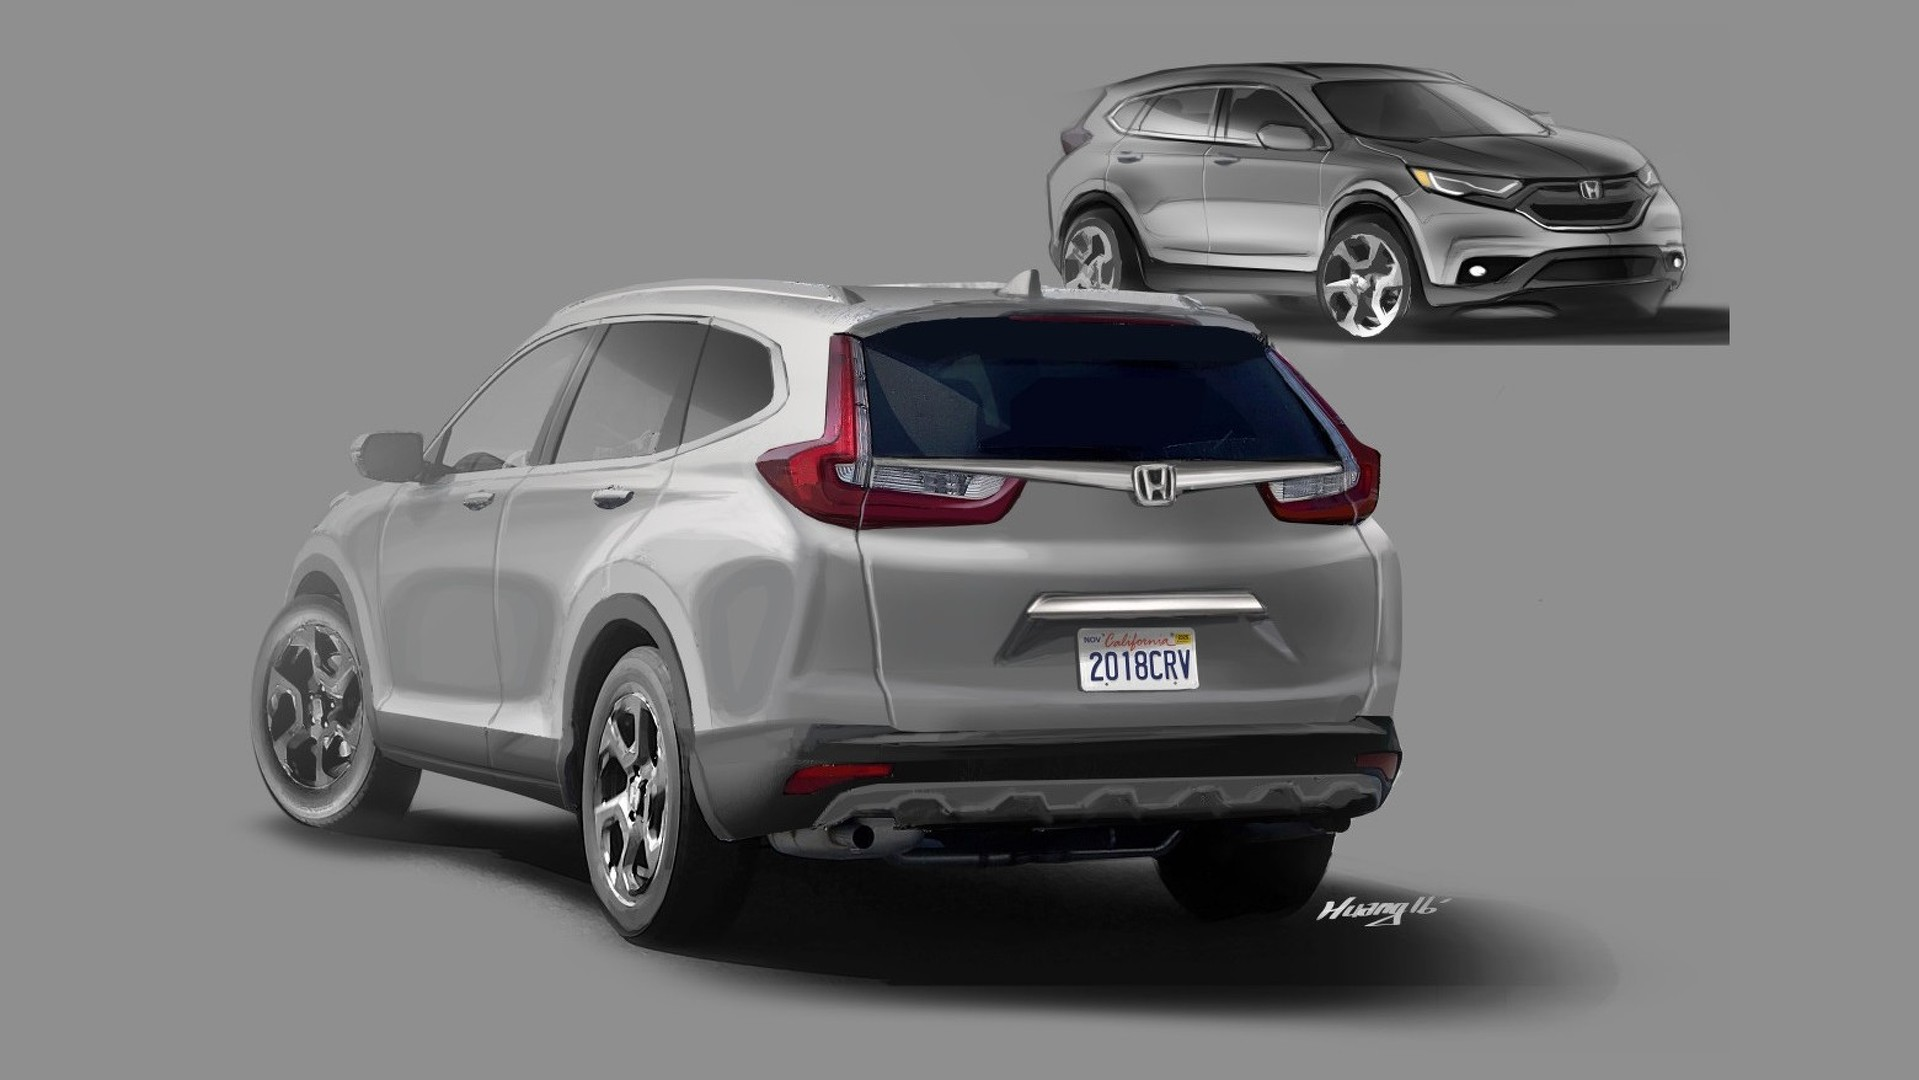 Reader envisions 2018 Honda CR-V based on spy shots